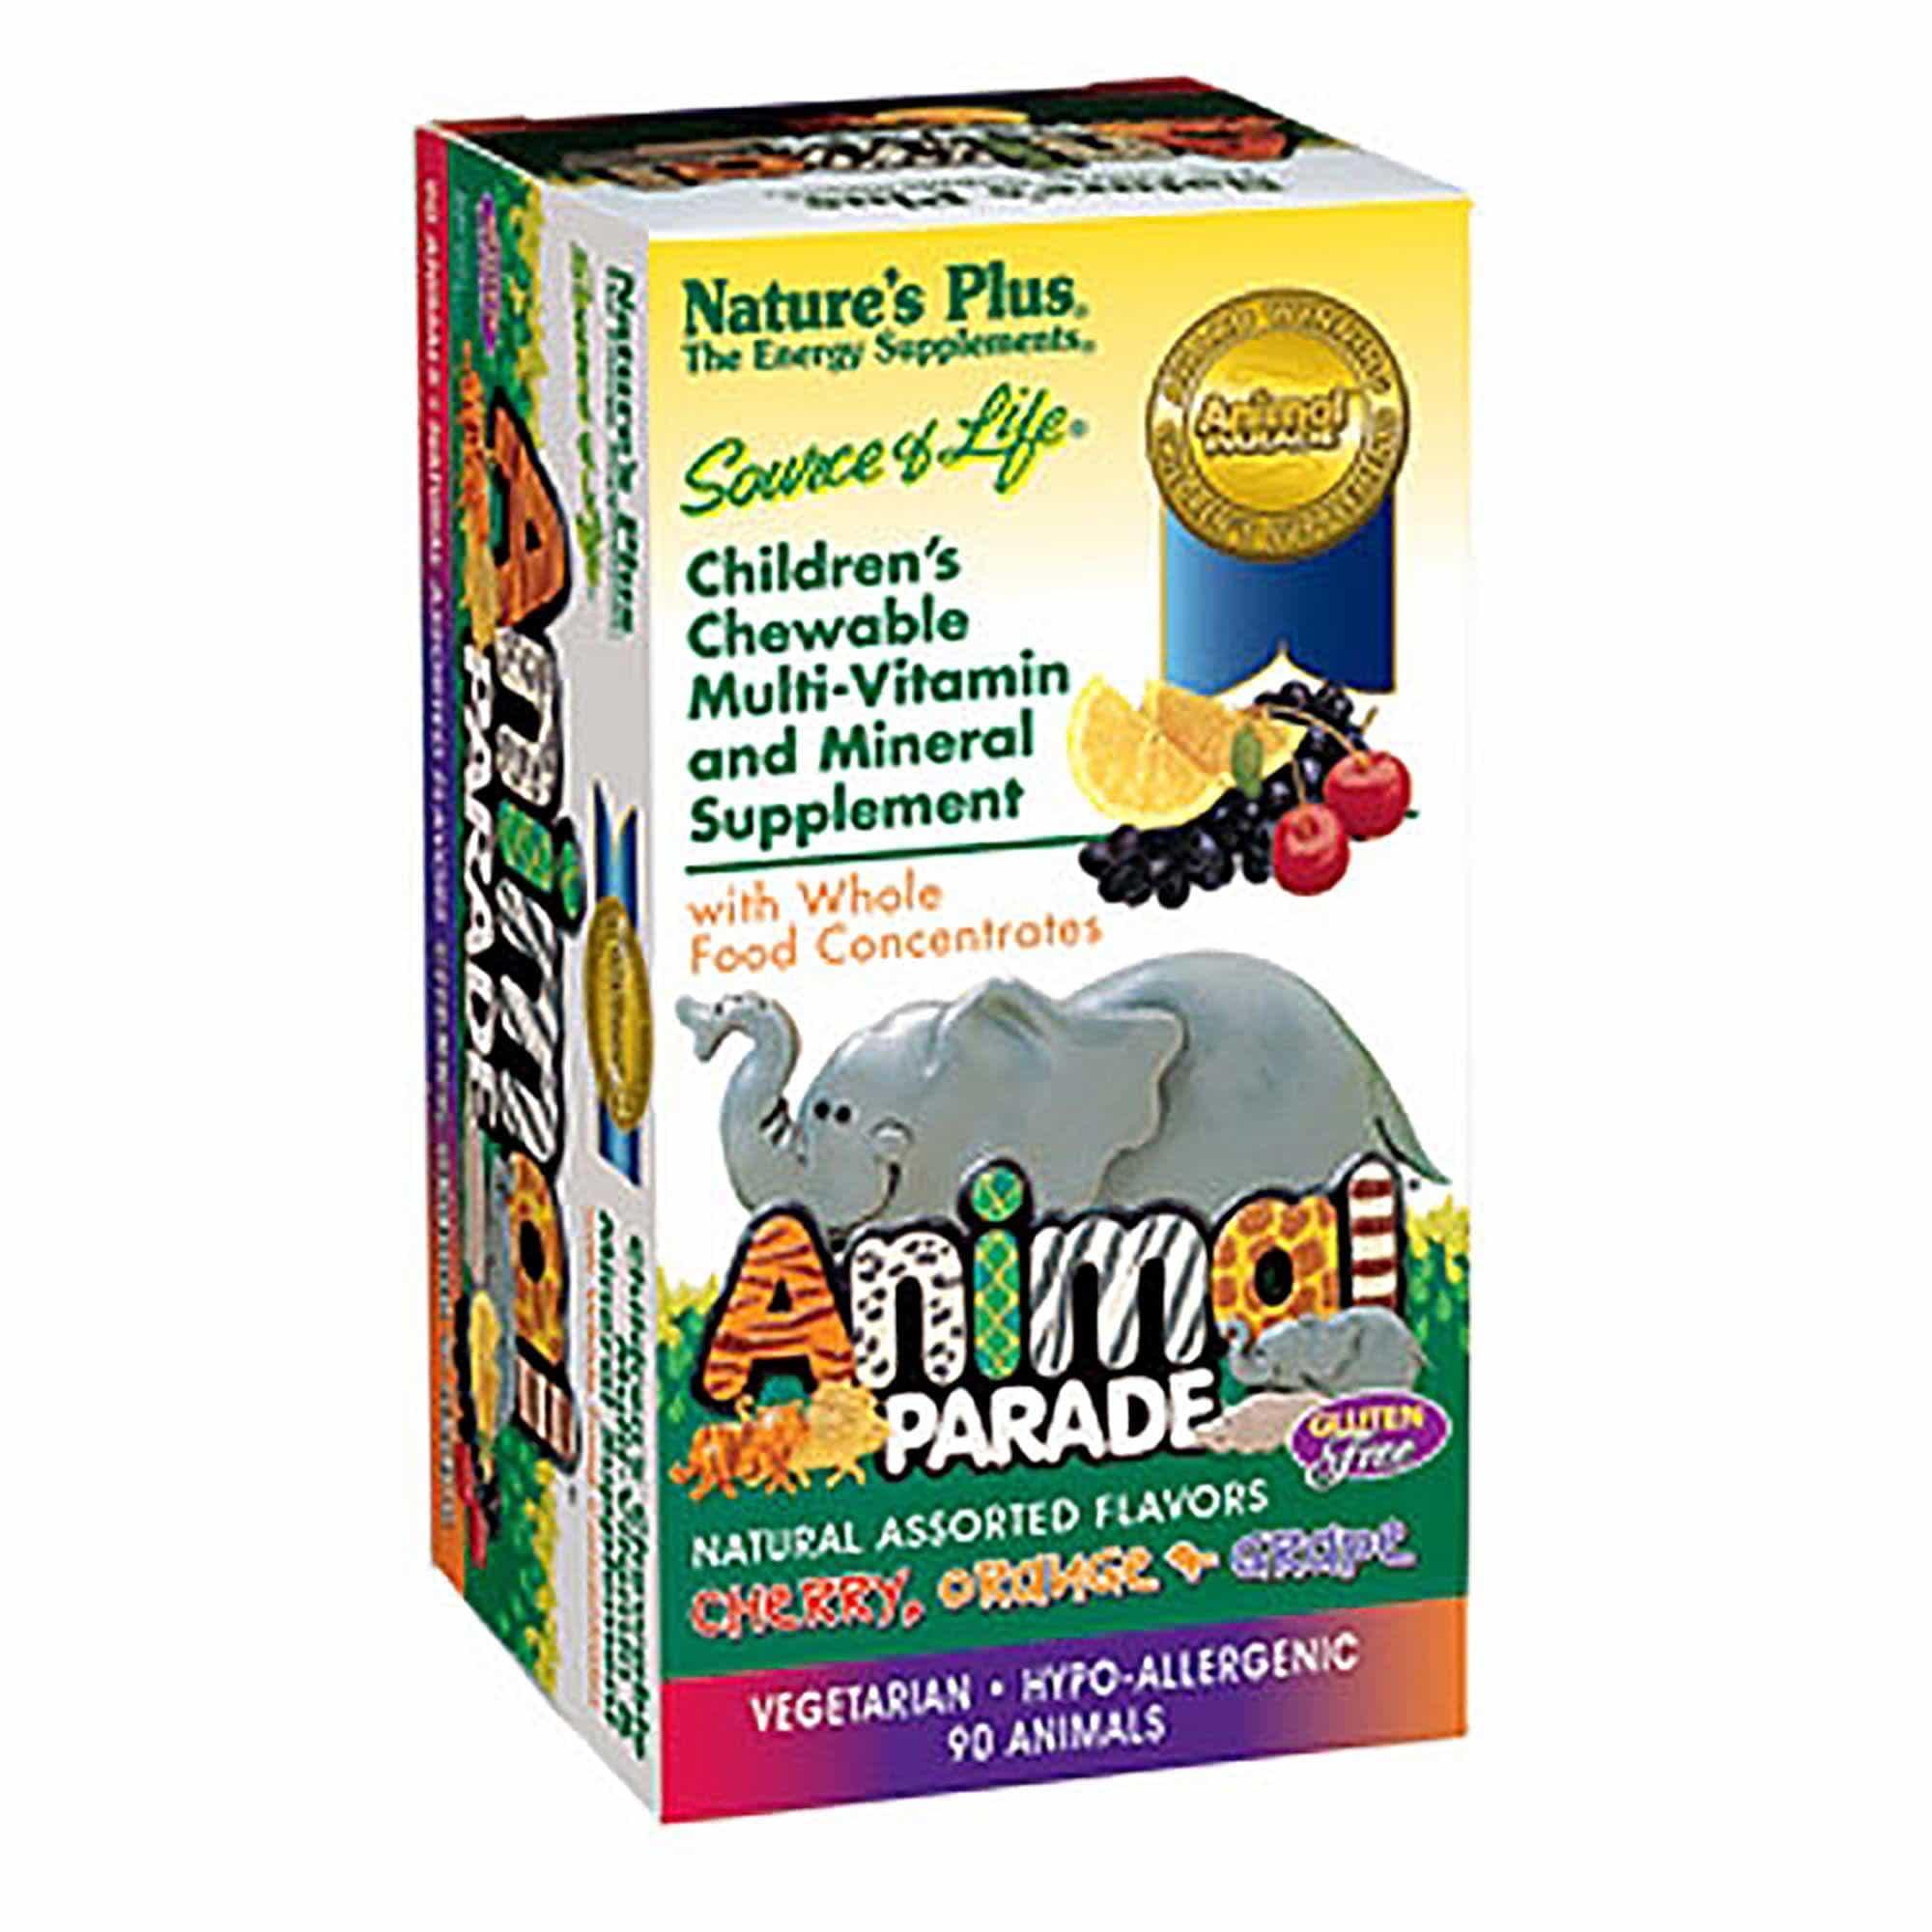 Nature's Plus Animal Parade Assorted Πολυβιταμινούχα Ζελεδάκια για Παιδιά, σε διάφορες γεύσεις, 90 gummies